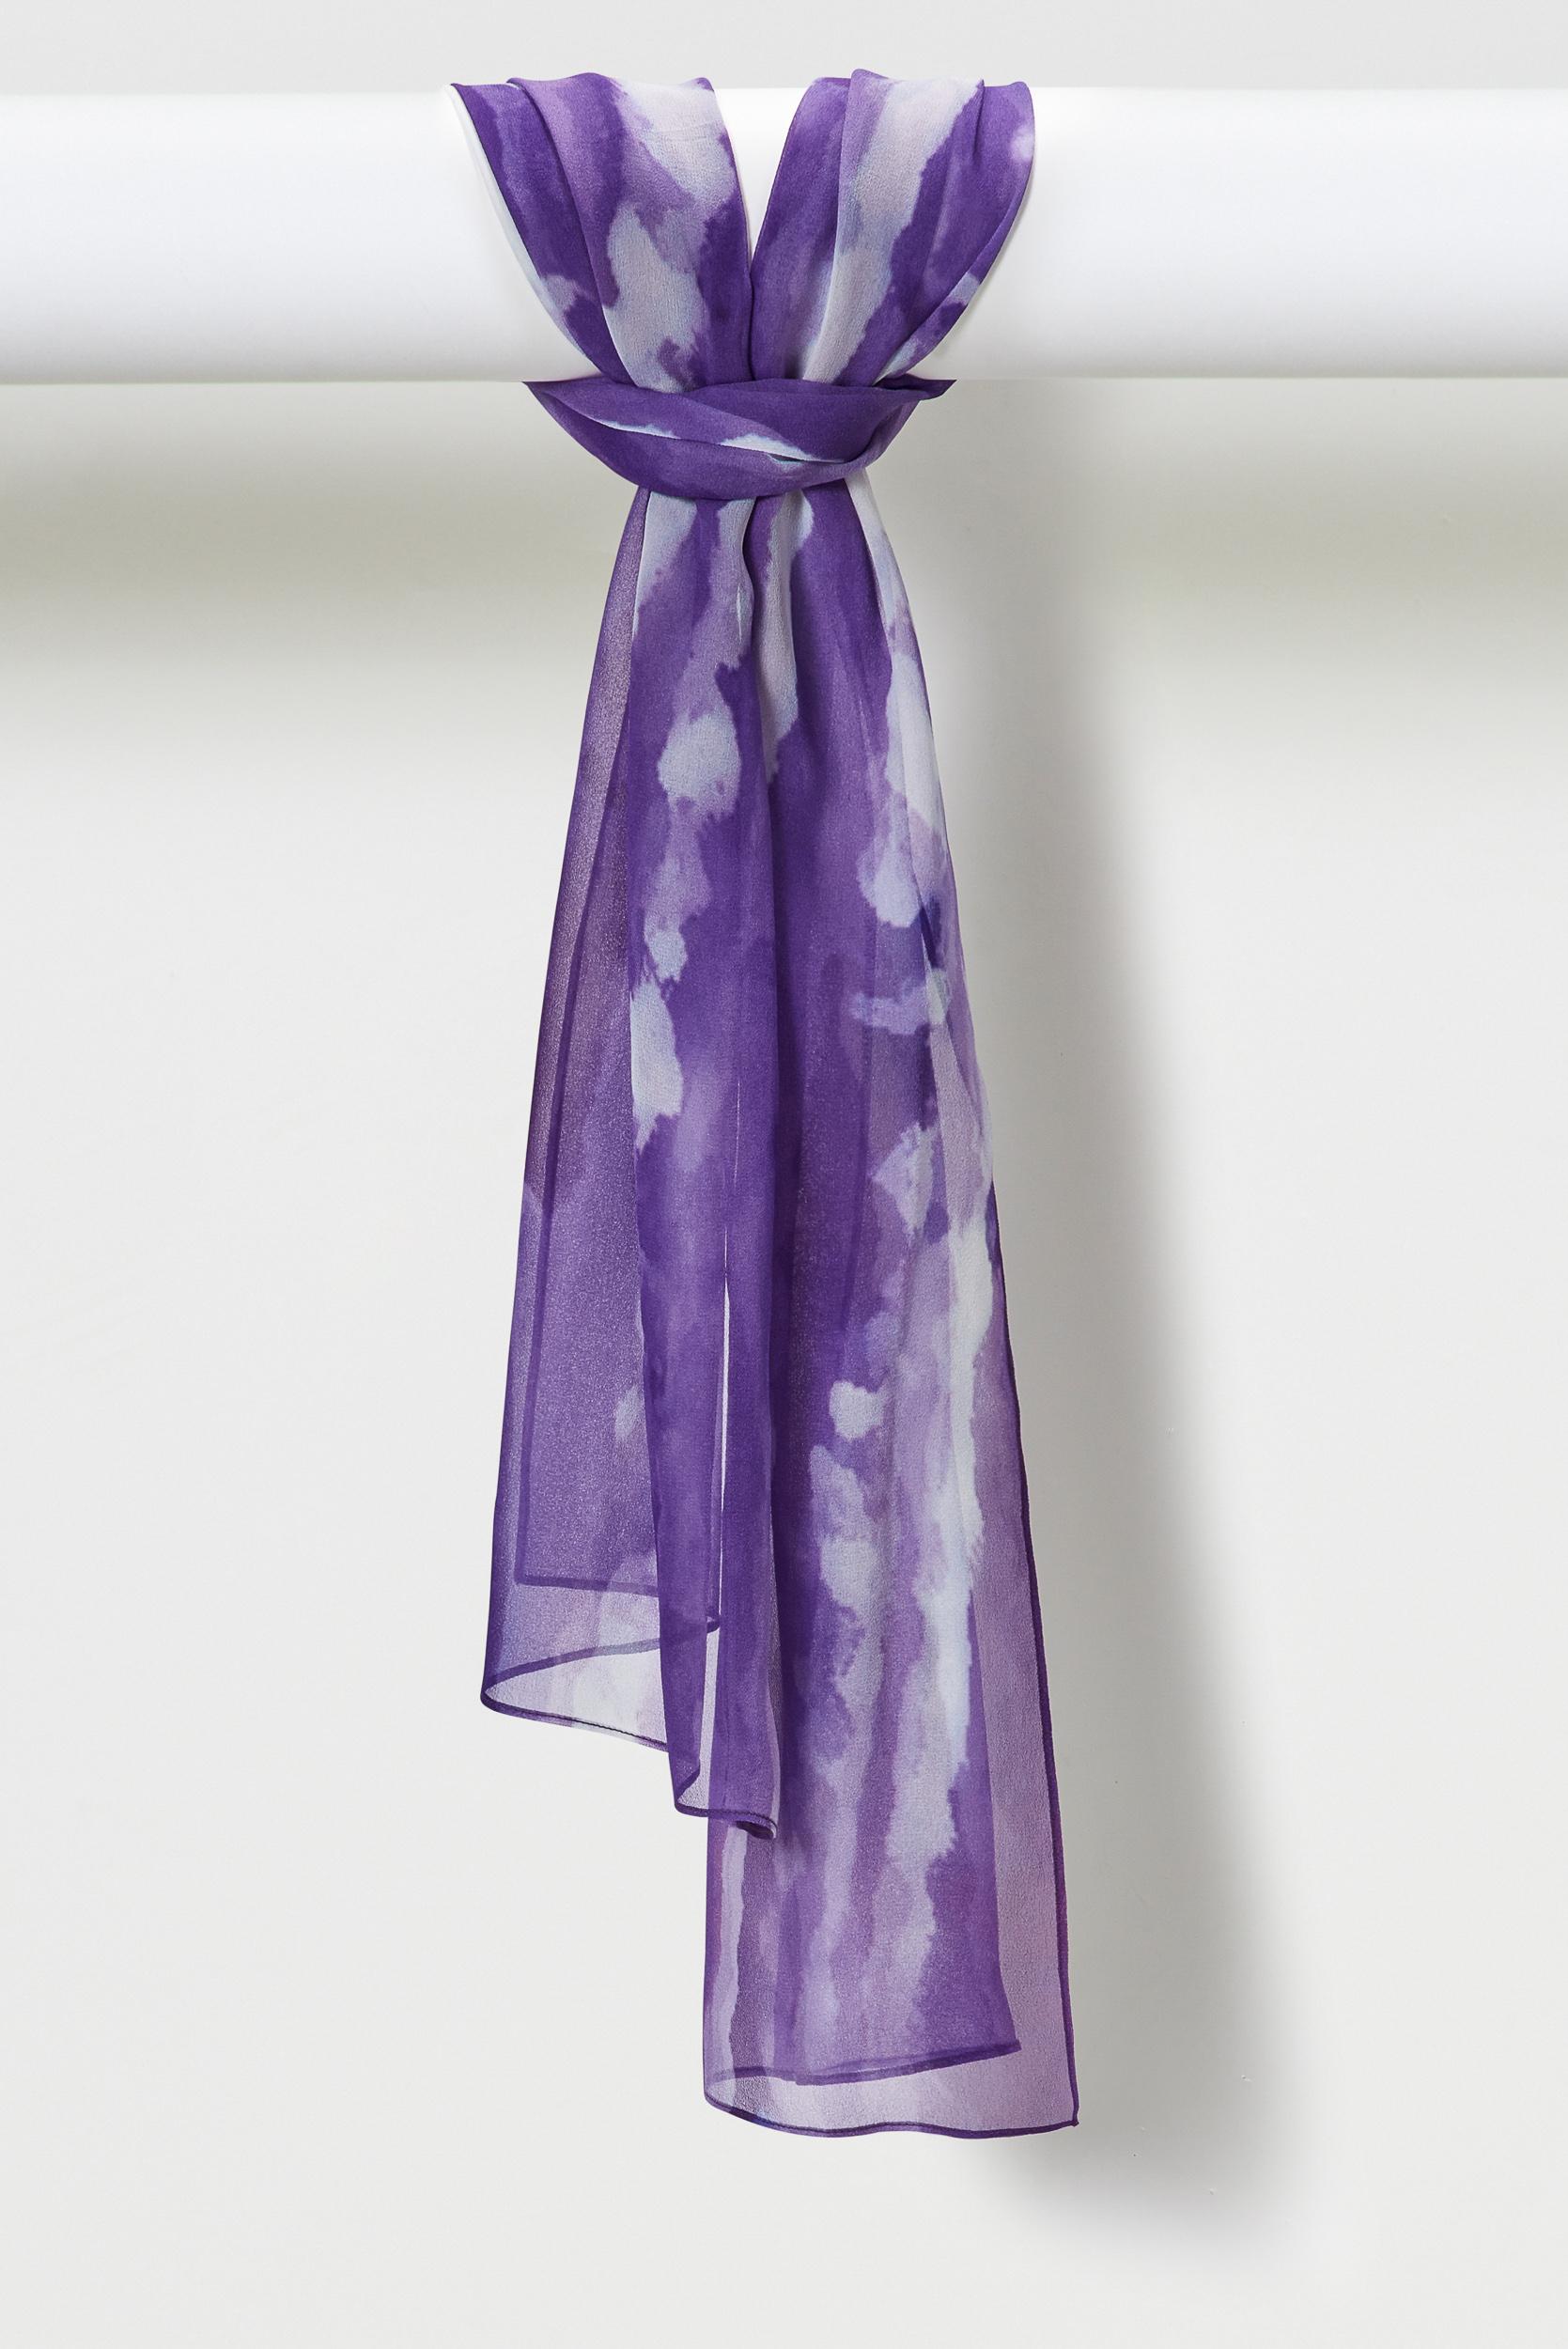 LightSprays_2Color_PurpleWhite2.jpg